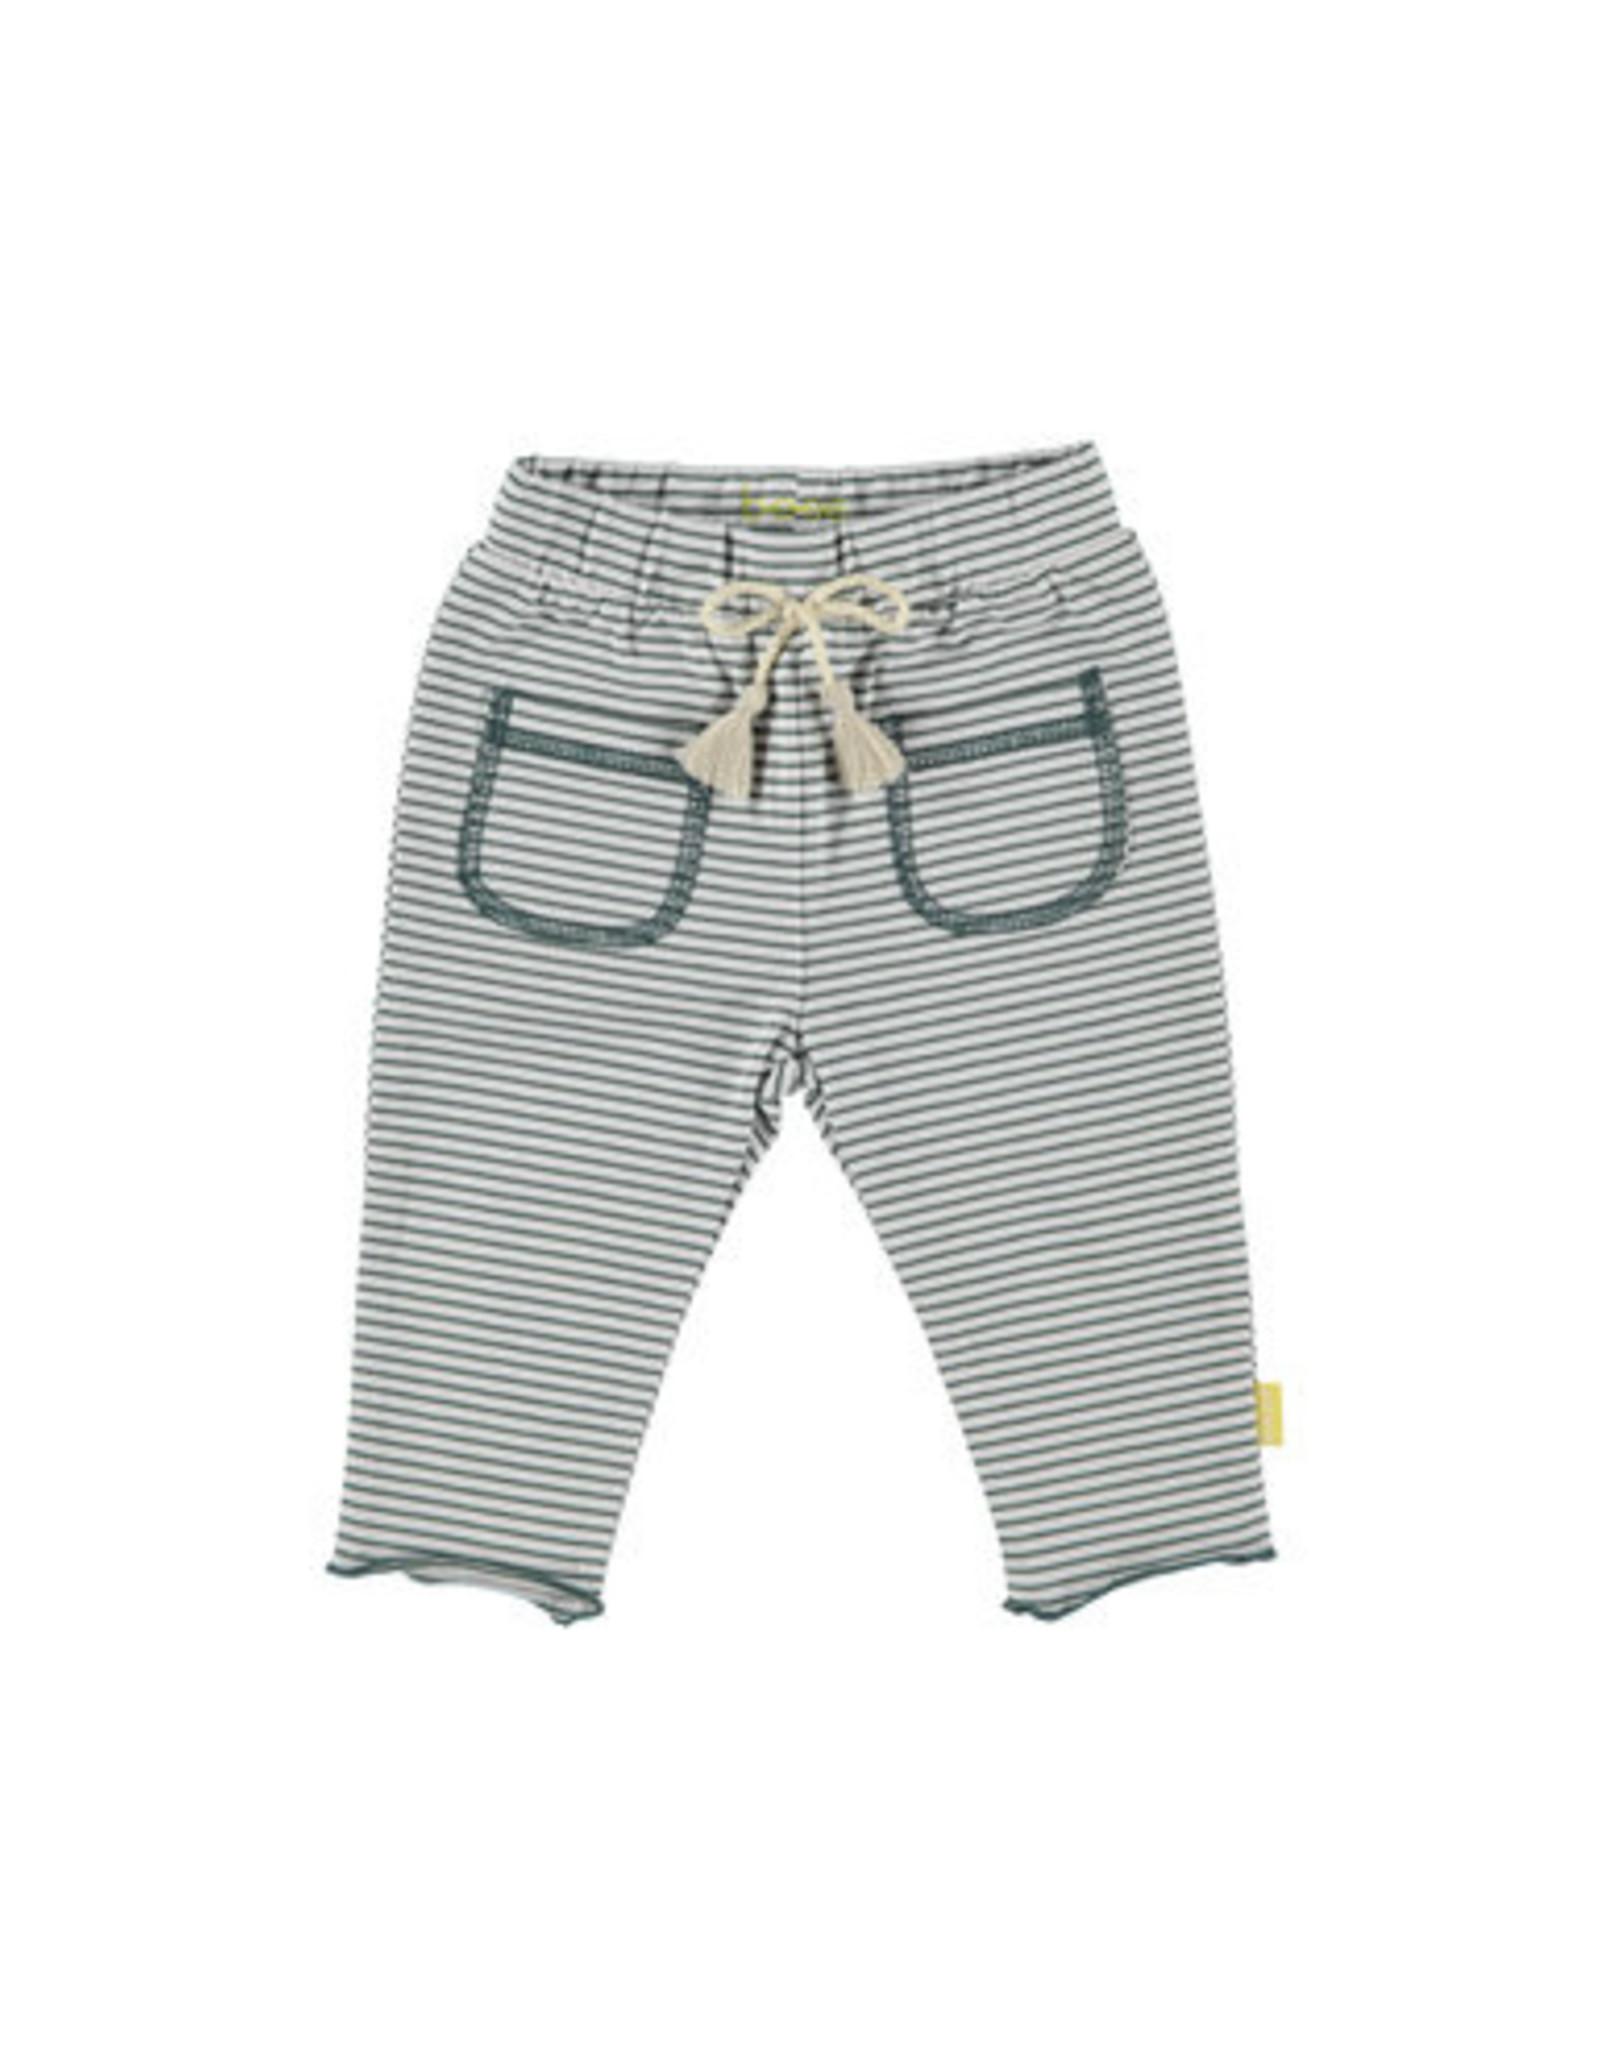 BESS Bess Pants Striped Pockets White